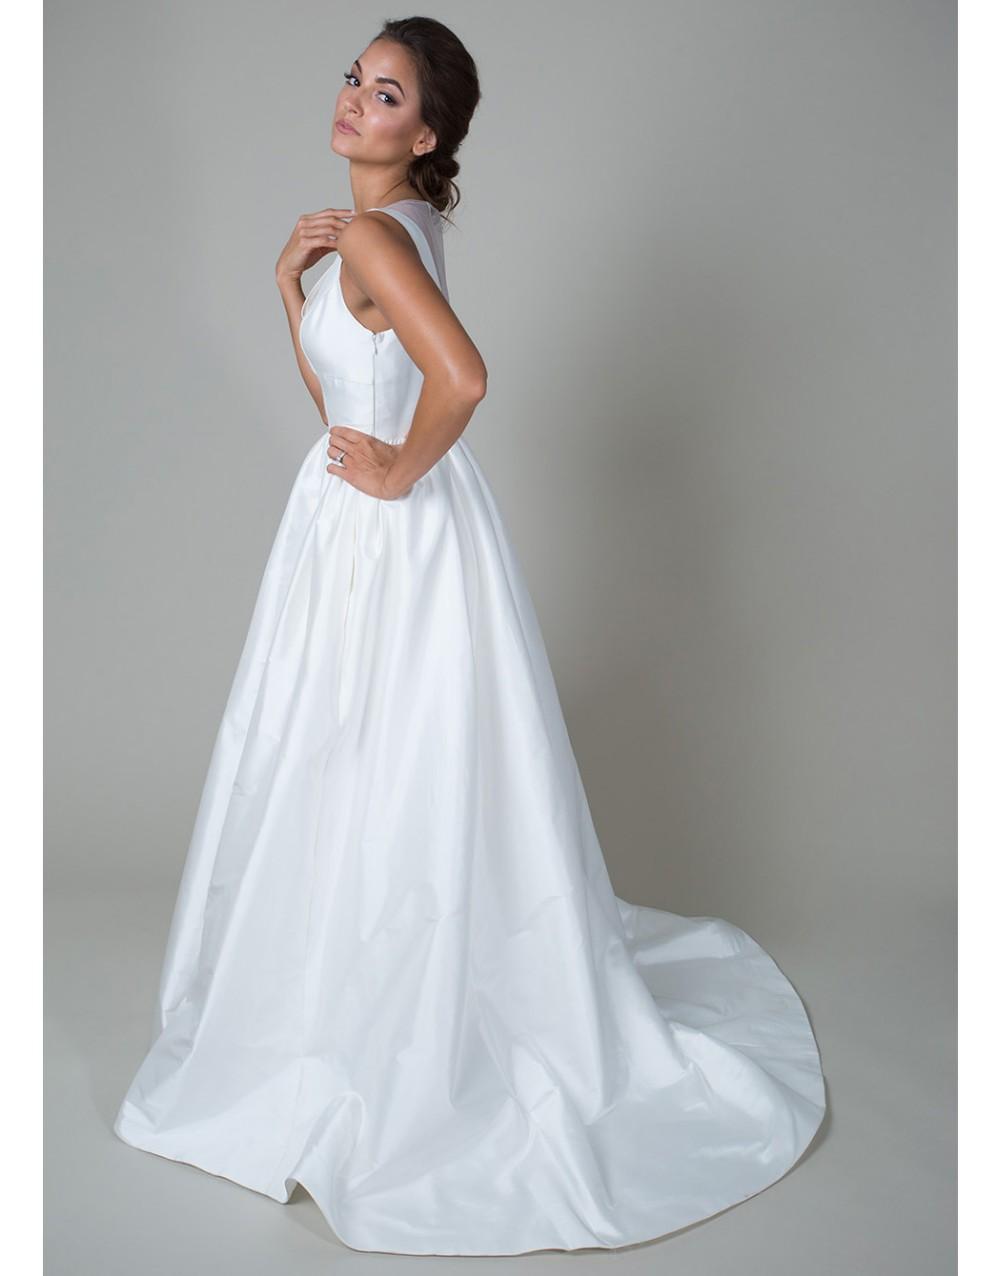 Vintage long white summer boho beach wedding dress with pockets 2015 v neck see through bridal gowns vestidos de noiva UD-442 3